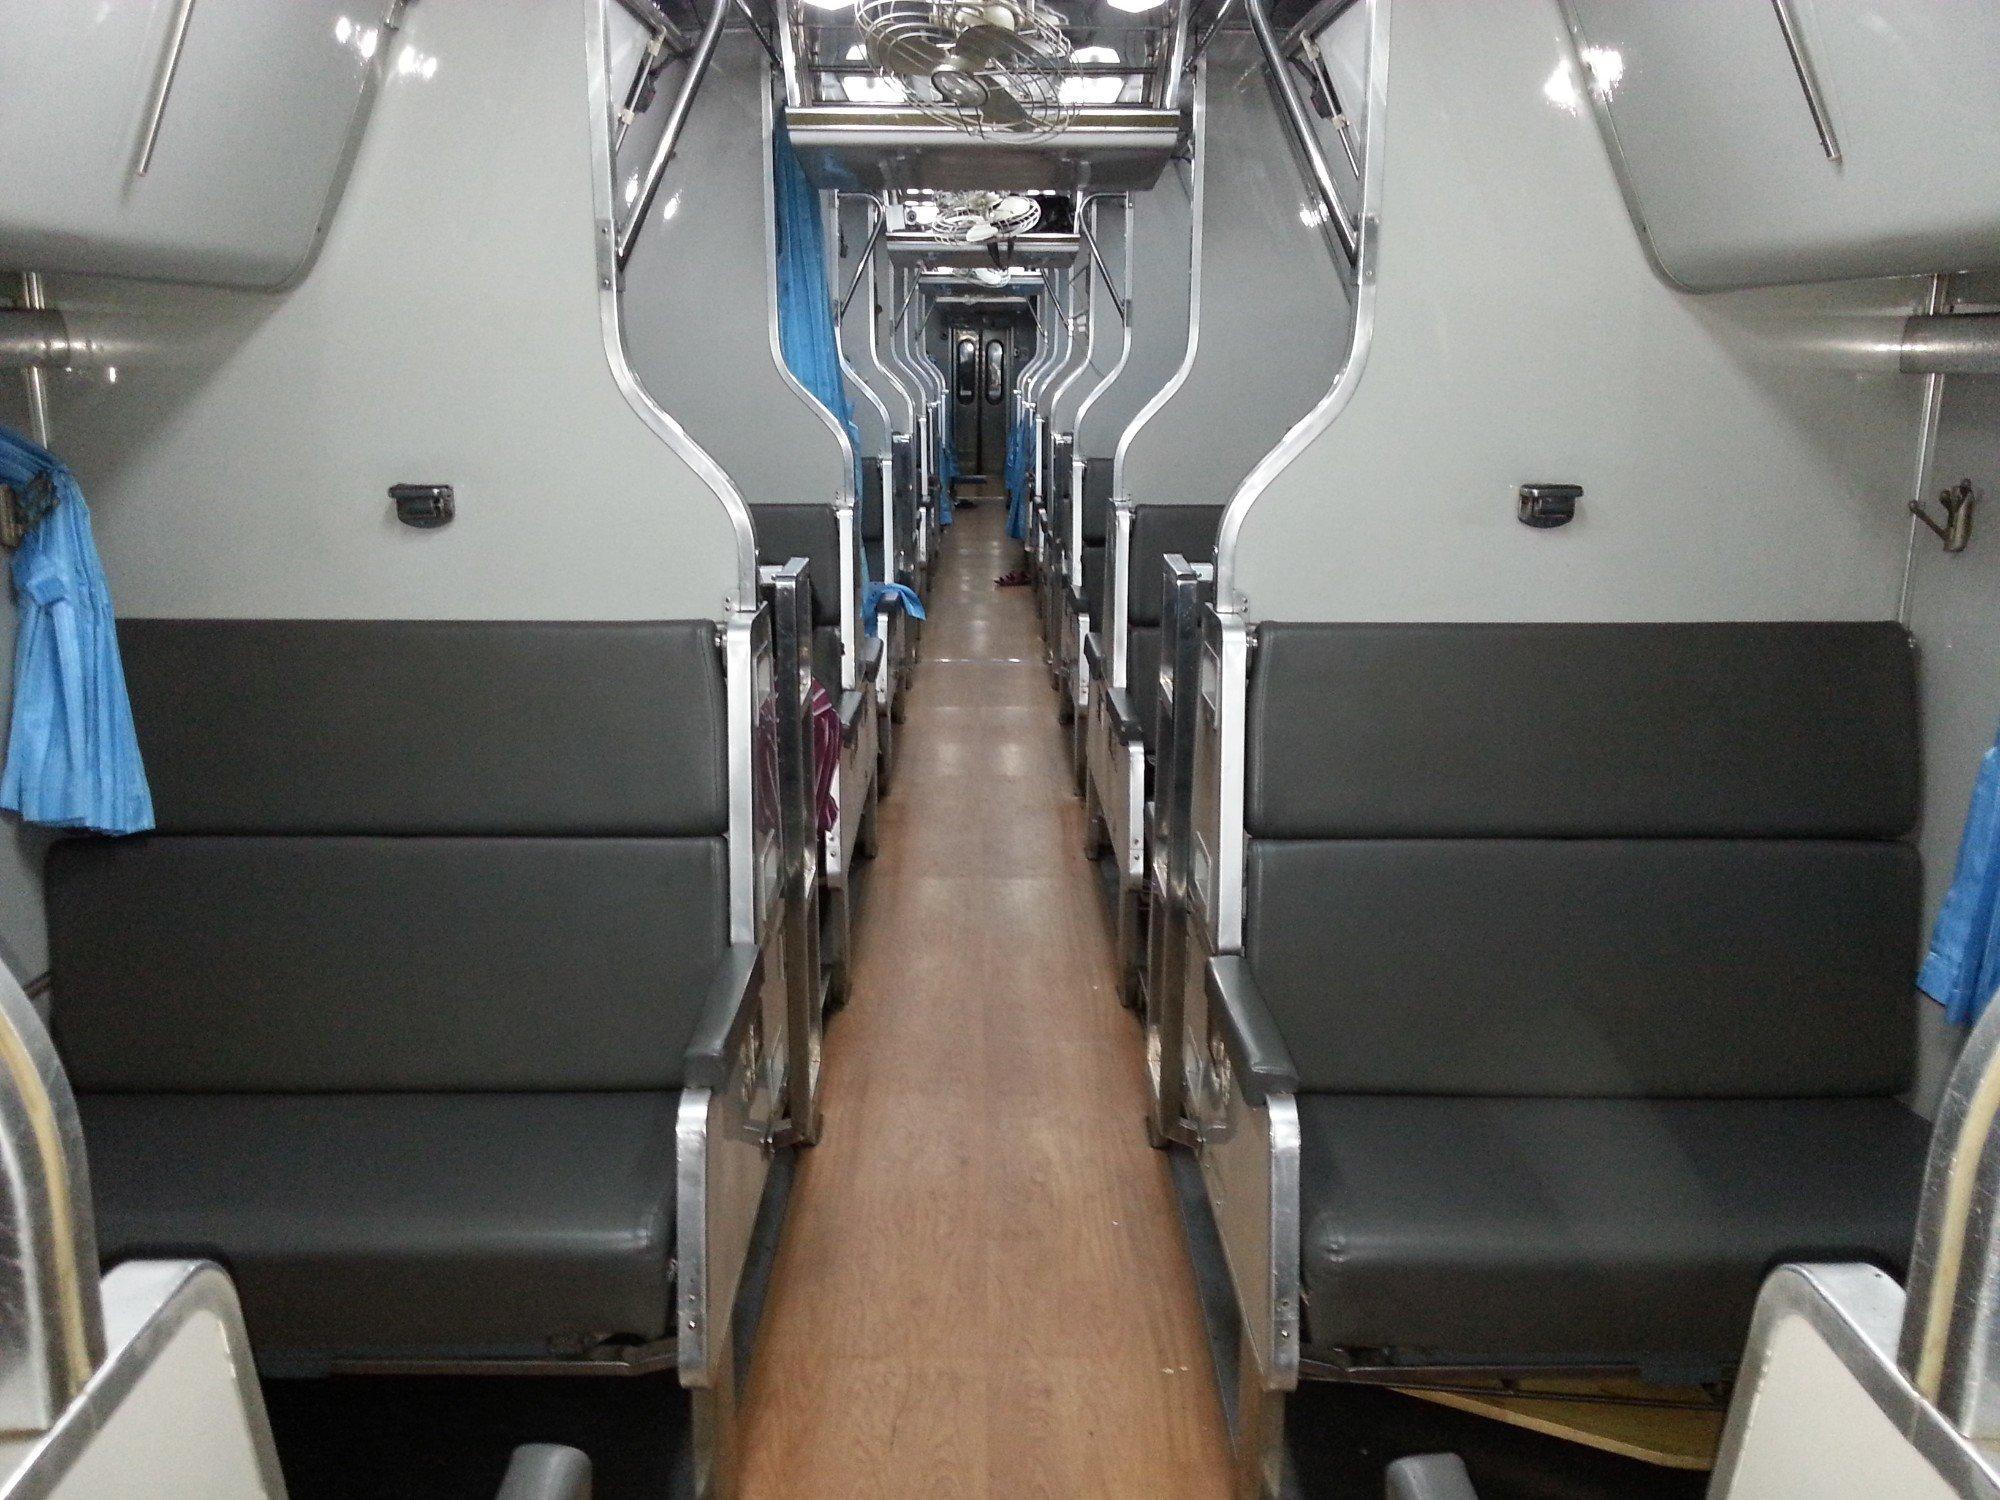 2nd Class AC carriage on a Thai train